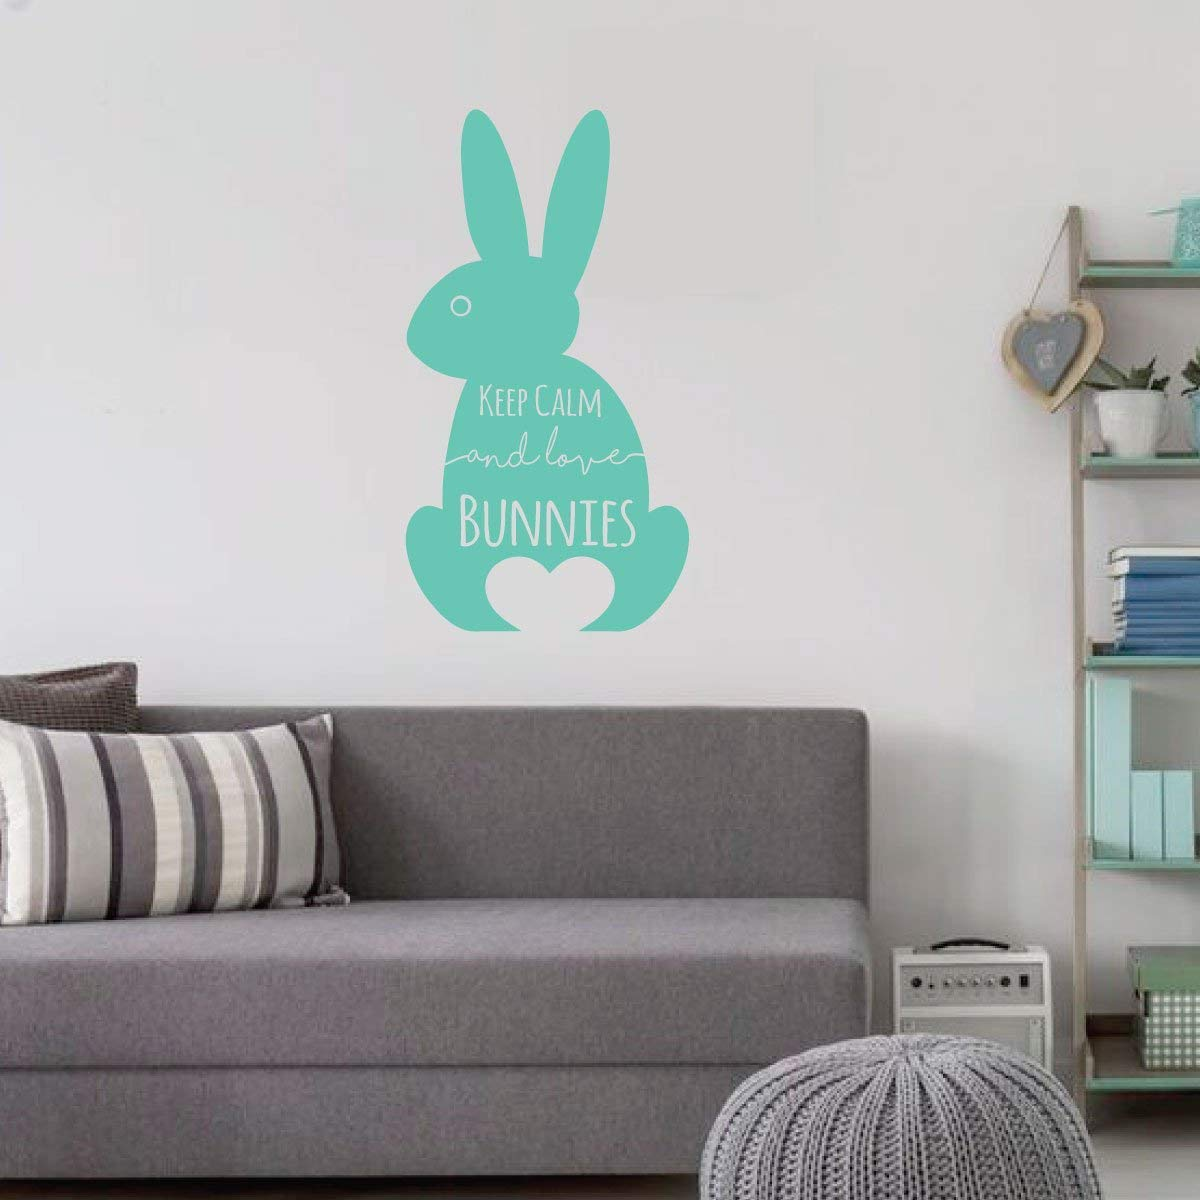 SHOW ME THE BUNNY Vinyl Design Wall Art Sticker Decal Home Decor Window